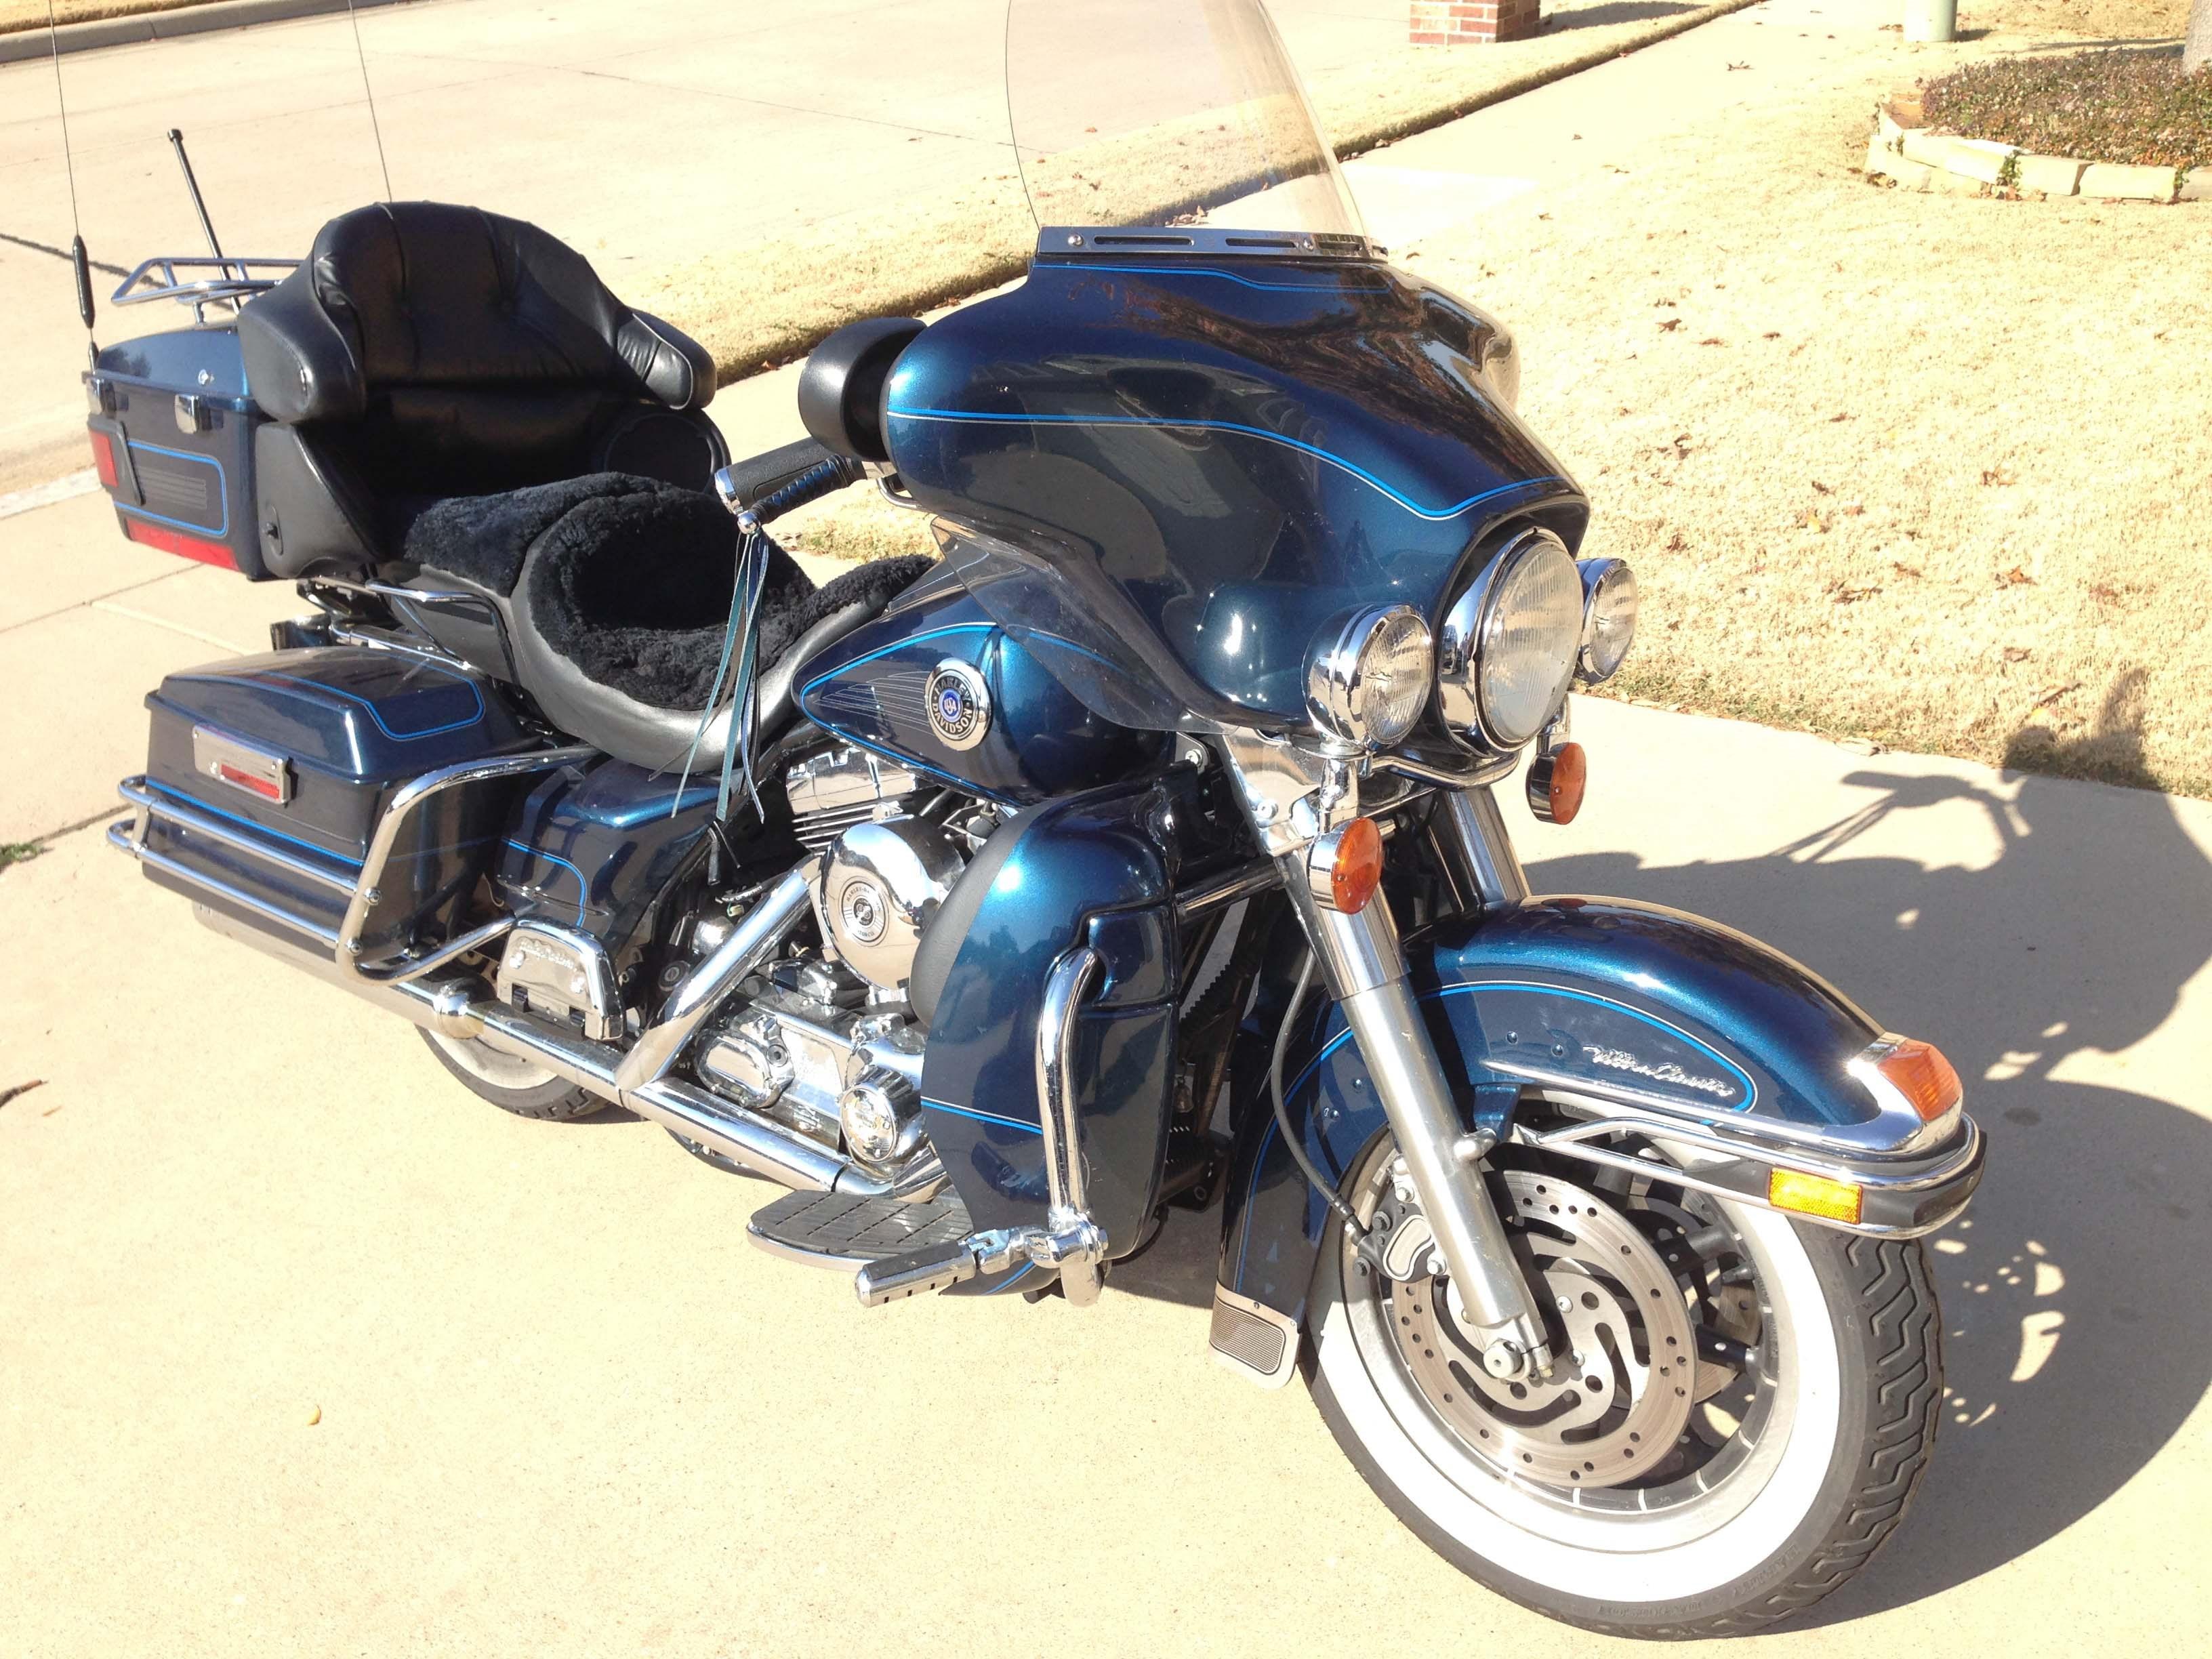 2001 Harley Davidson® FLHTC/I Electra Glide® Classic Blue ...